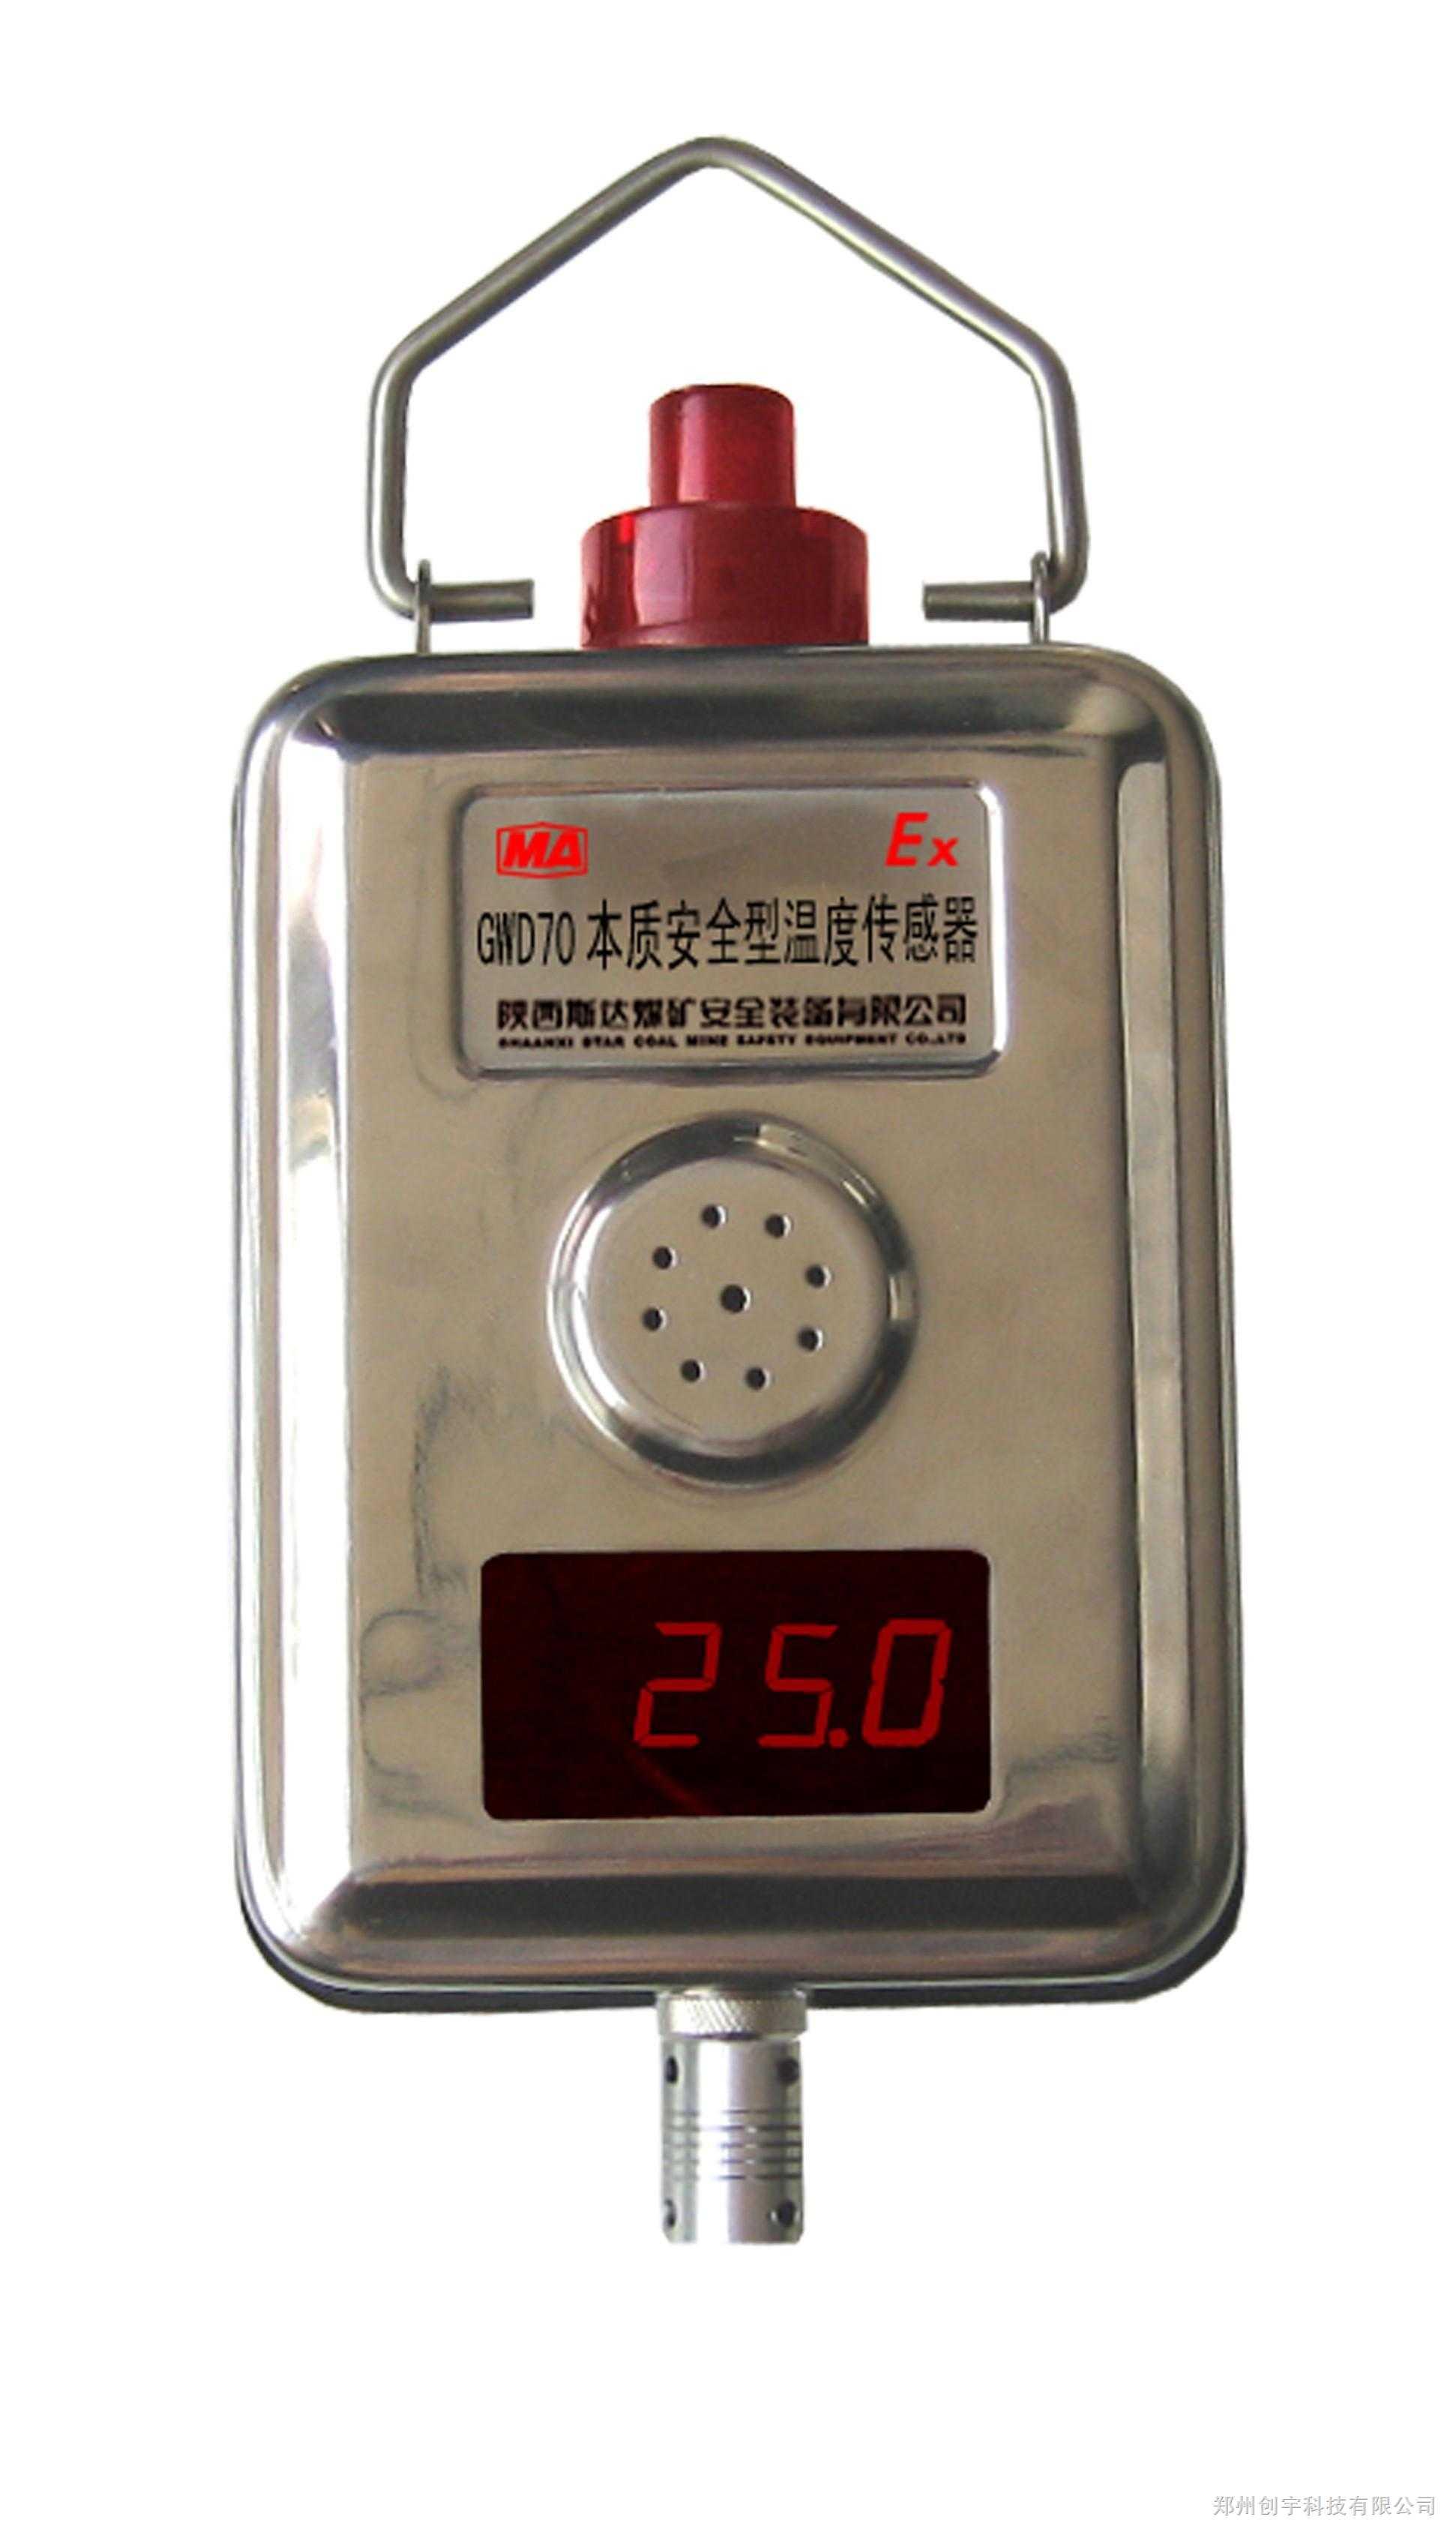 gwd70型-矿用温度传感器-郑州创宇科技有限公司